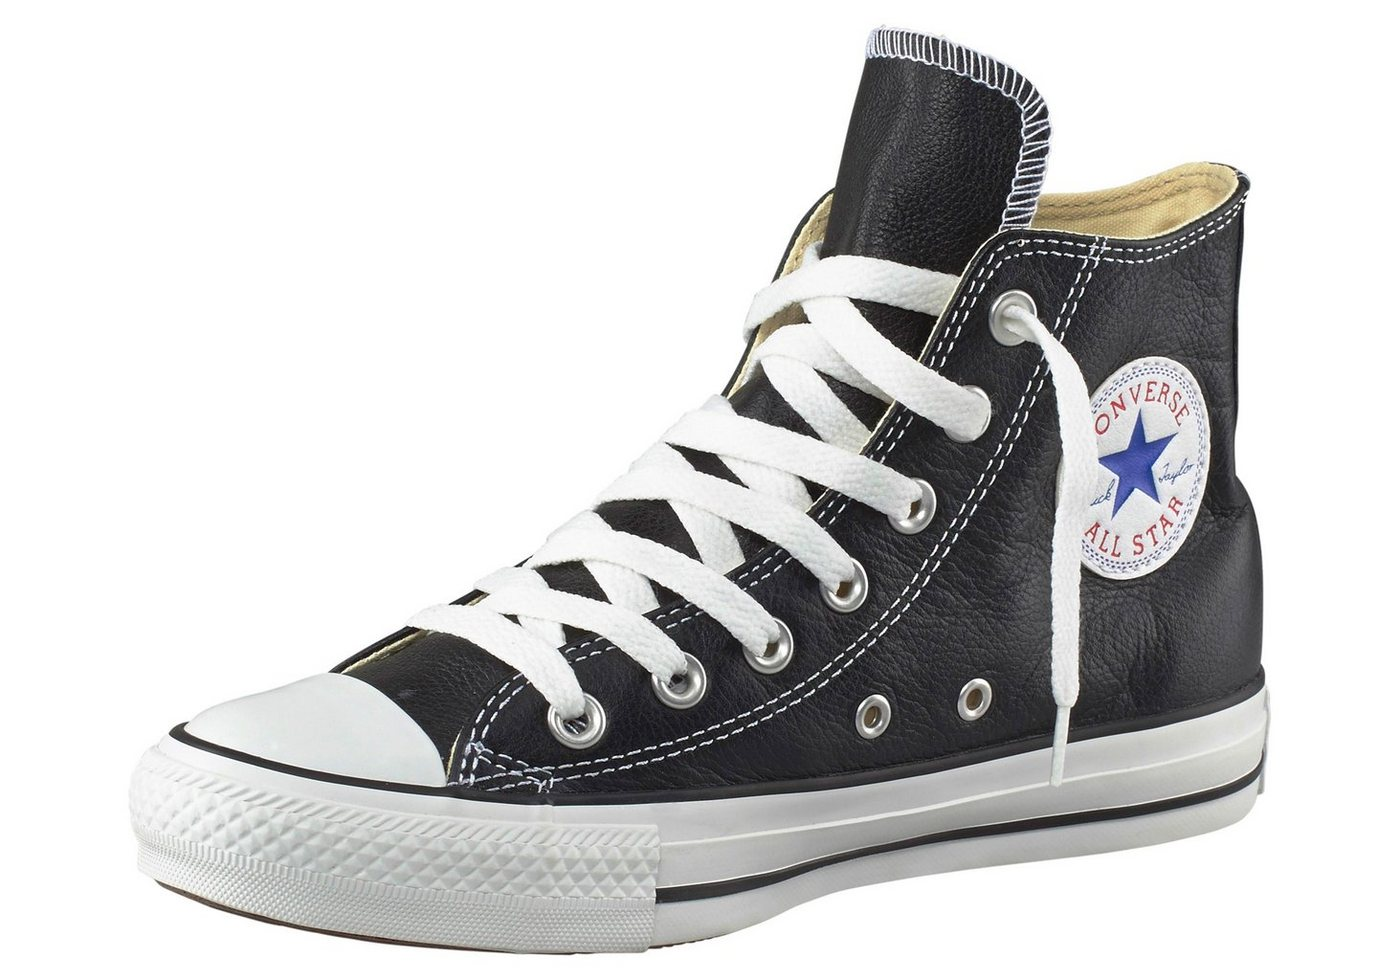 Converse Sneaker 132170C ALL STAR HI LEATHER CO SNEAKERS Herren BLACK jetztbilligerkaufen